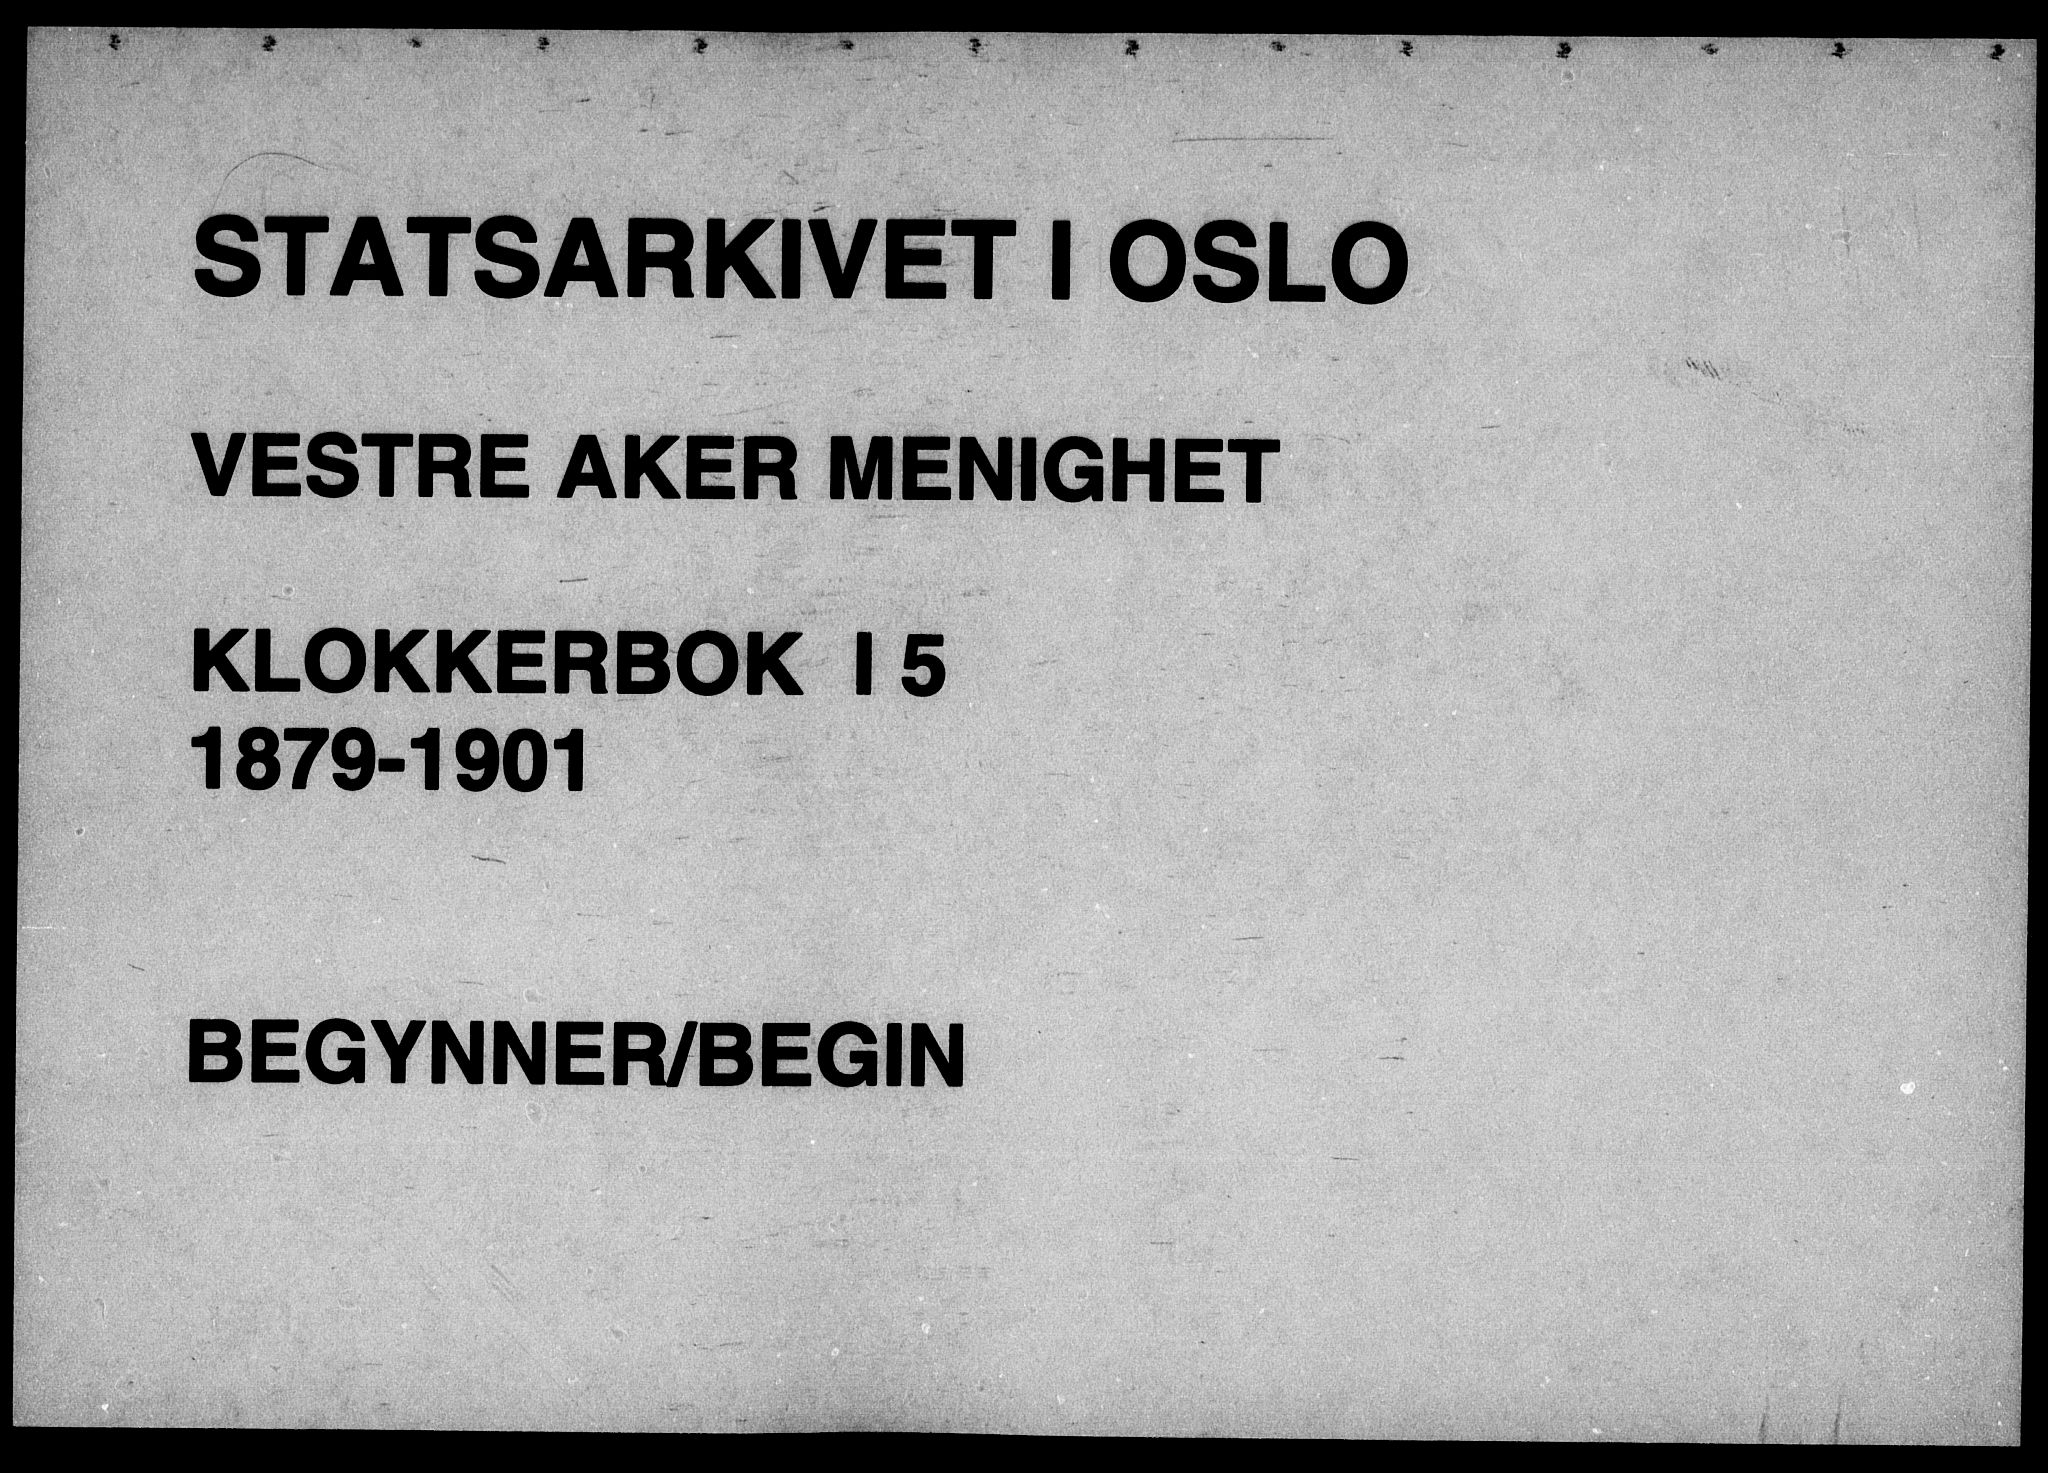 SAO, Vestre Aker prestekontor Kirkebøker, G/Ga/L0005: Klokkerbok nr. I 5, 1879-1901